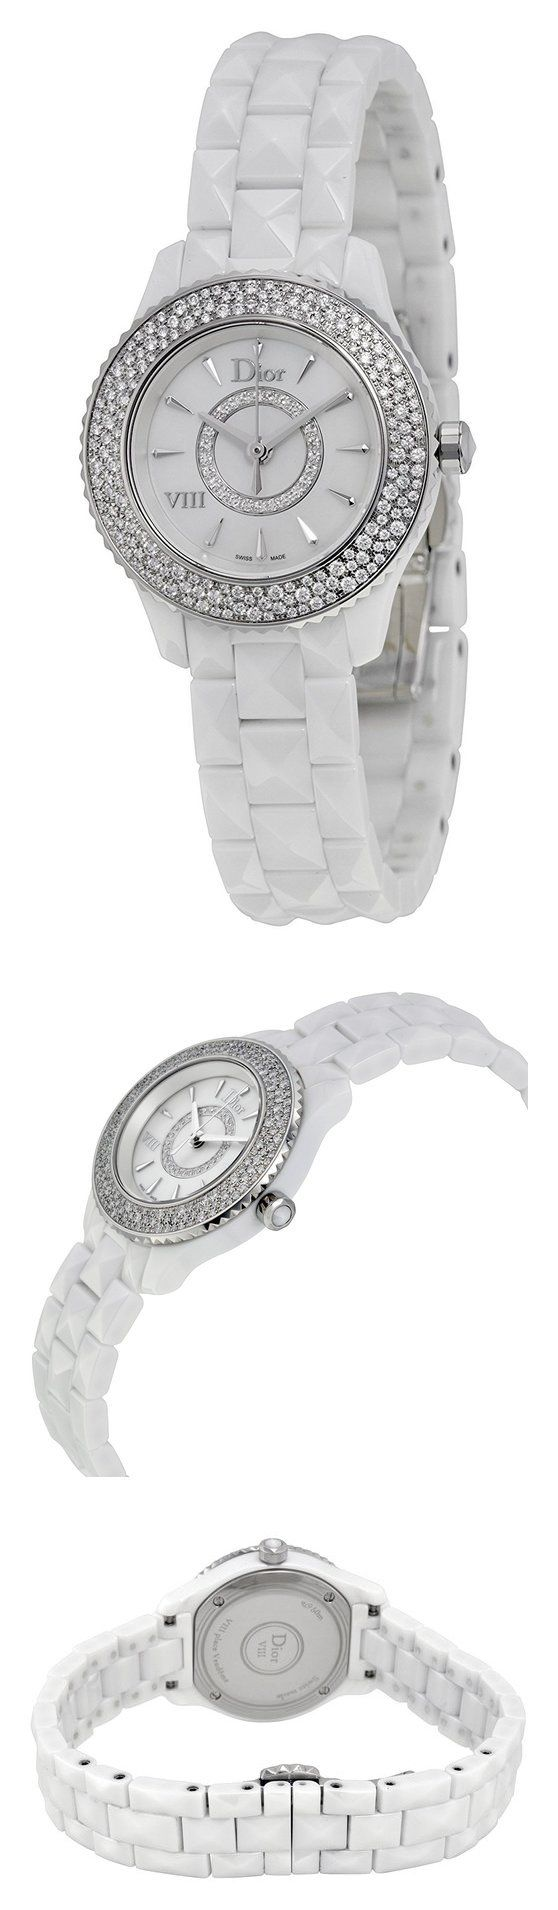 Christian Dior VIII Mother of Pearl White Hi Tech Ceramic Diamond Ladies Watch CD1221E4C001 #watch #christiandior #wrist_watches #watches #women #departments #shops